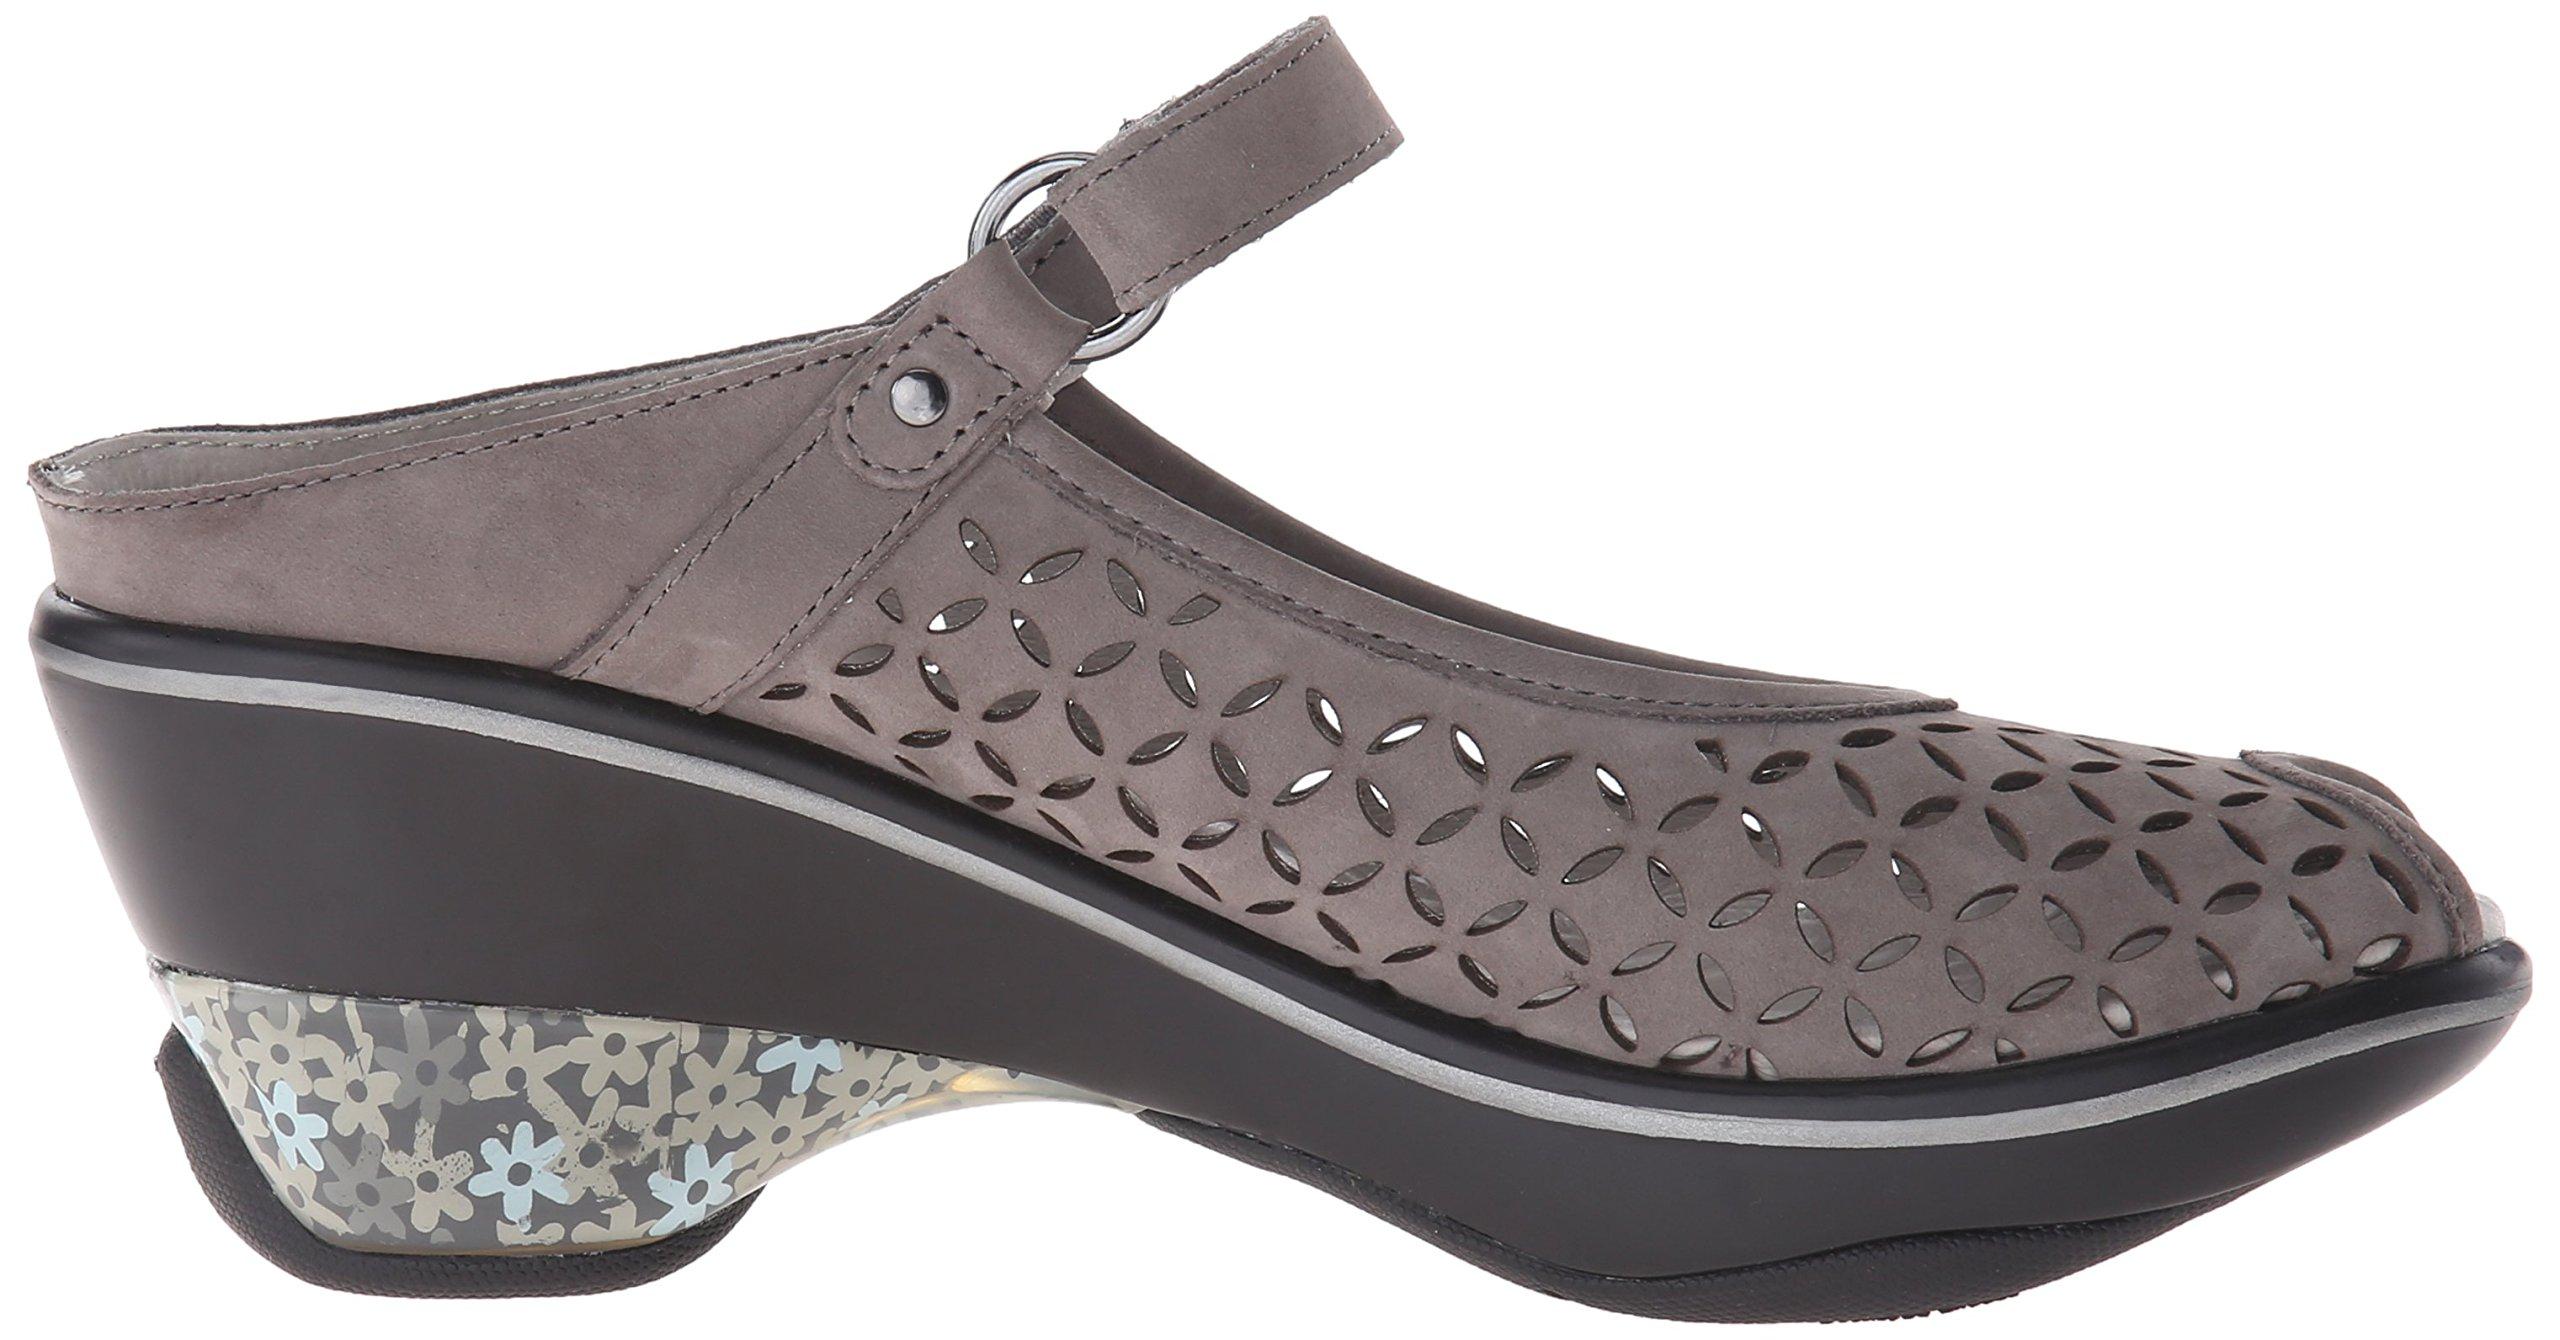 Jambu Women's Journey Encore Wedge Sandal, Dark Grey, 10 M US by Jambu (Image #7)